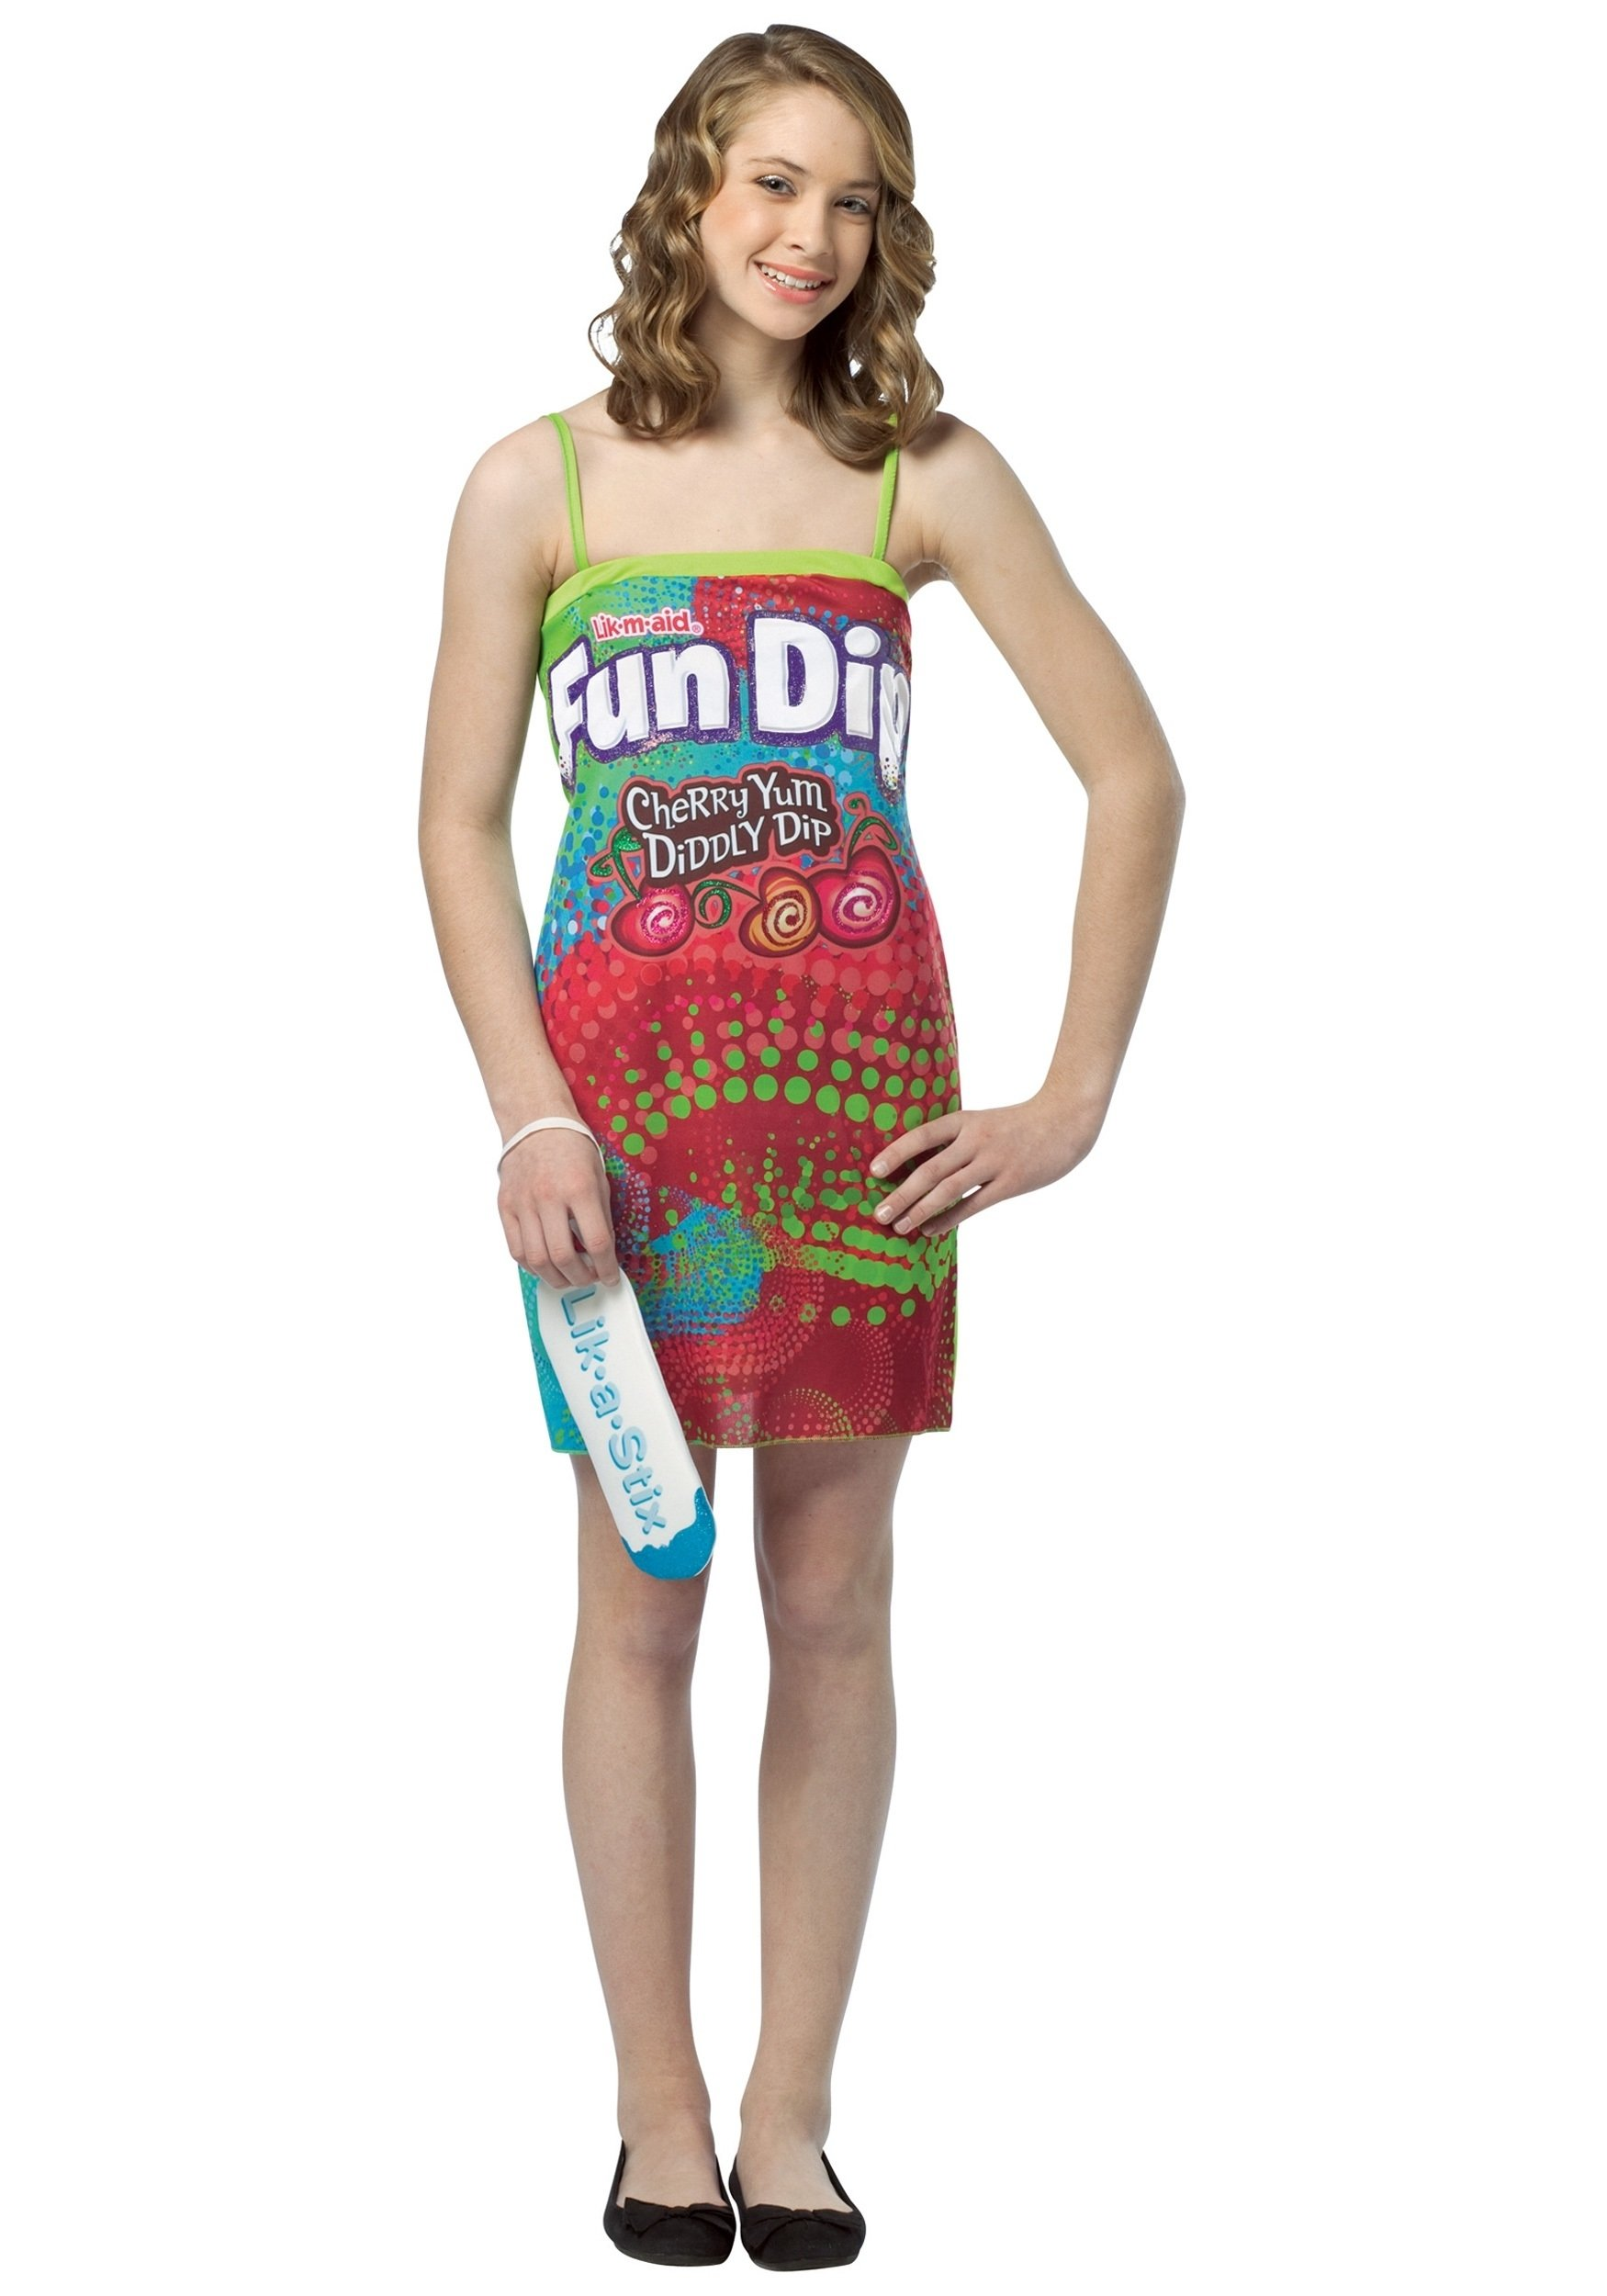 10 Ideal Cool Costume Ideas For Girls teen fun dip dress halloween pinterest teen fun fun dip and 10